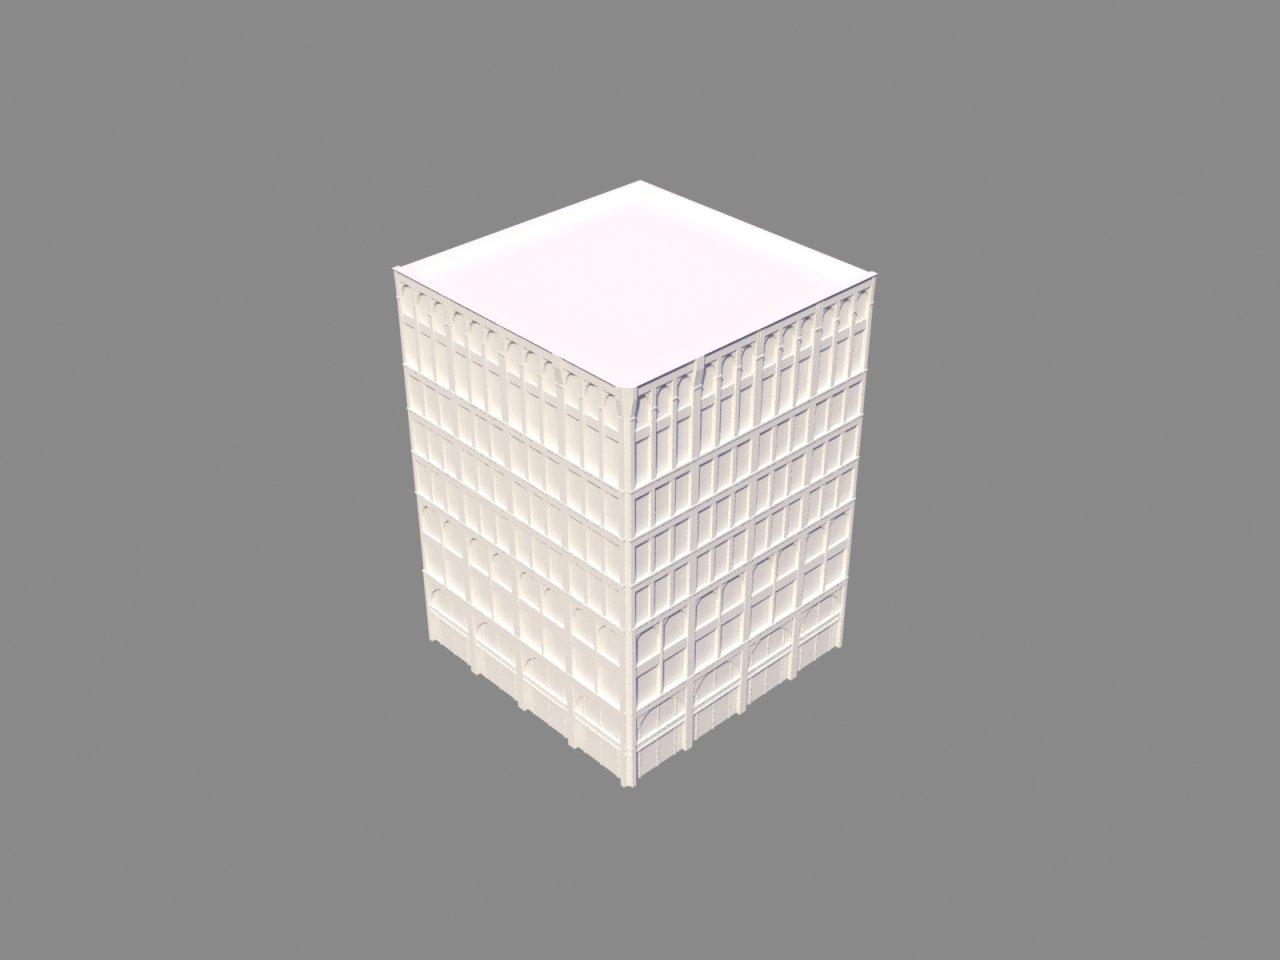 puck_corner.thumb.jpg.1b465c12f1edec0db6